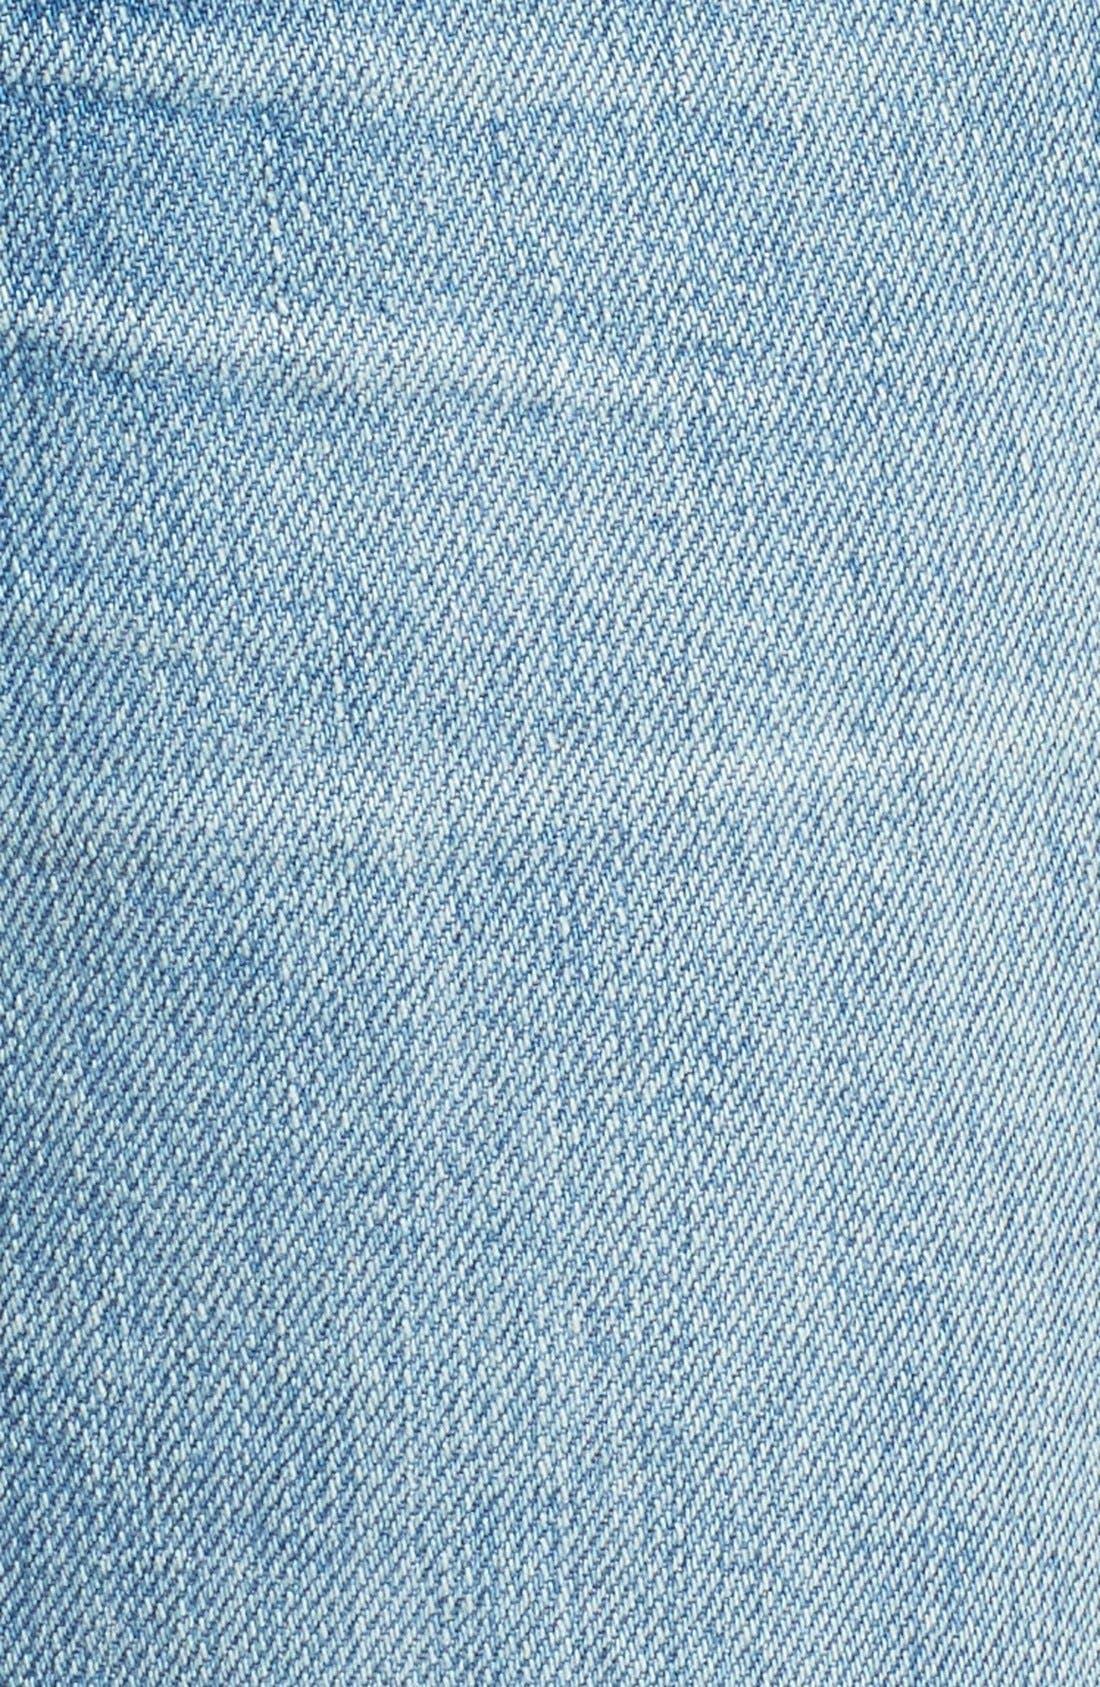 ,                             Perfect Vintage Ripped High Waist Boyfriend Jeans,                             Alternate thumbnail 7, color,                             400